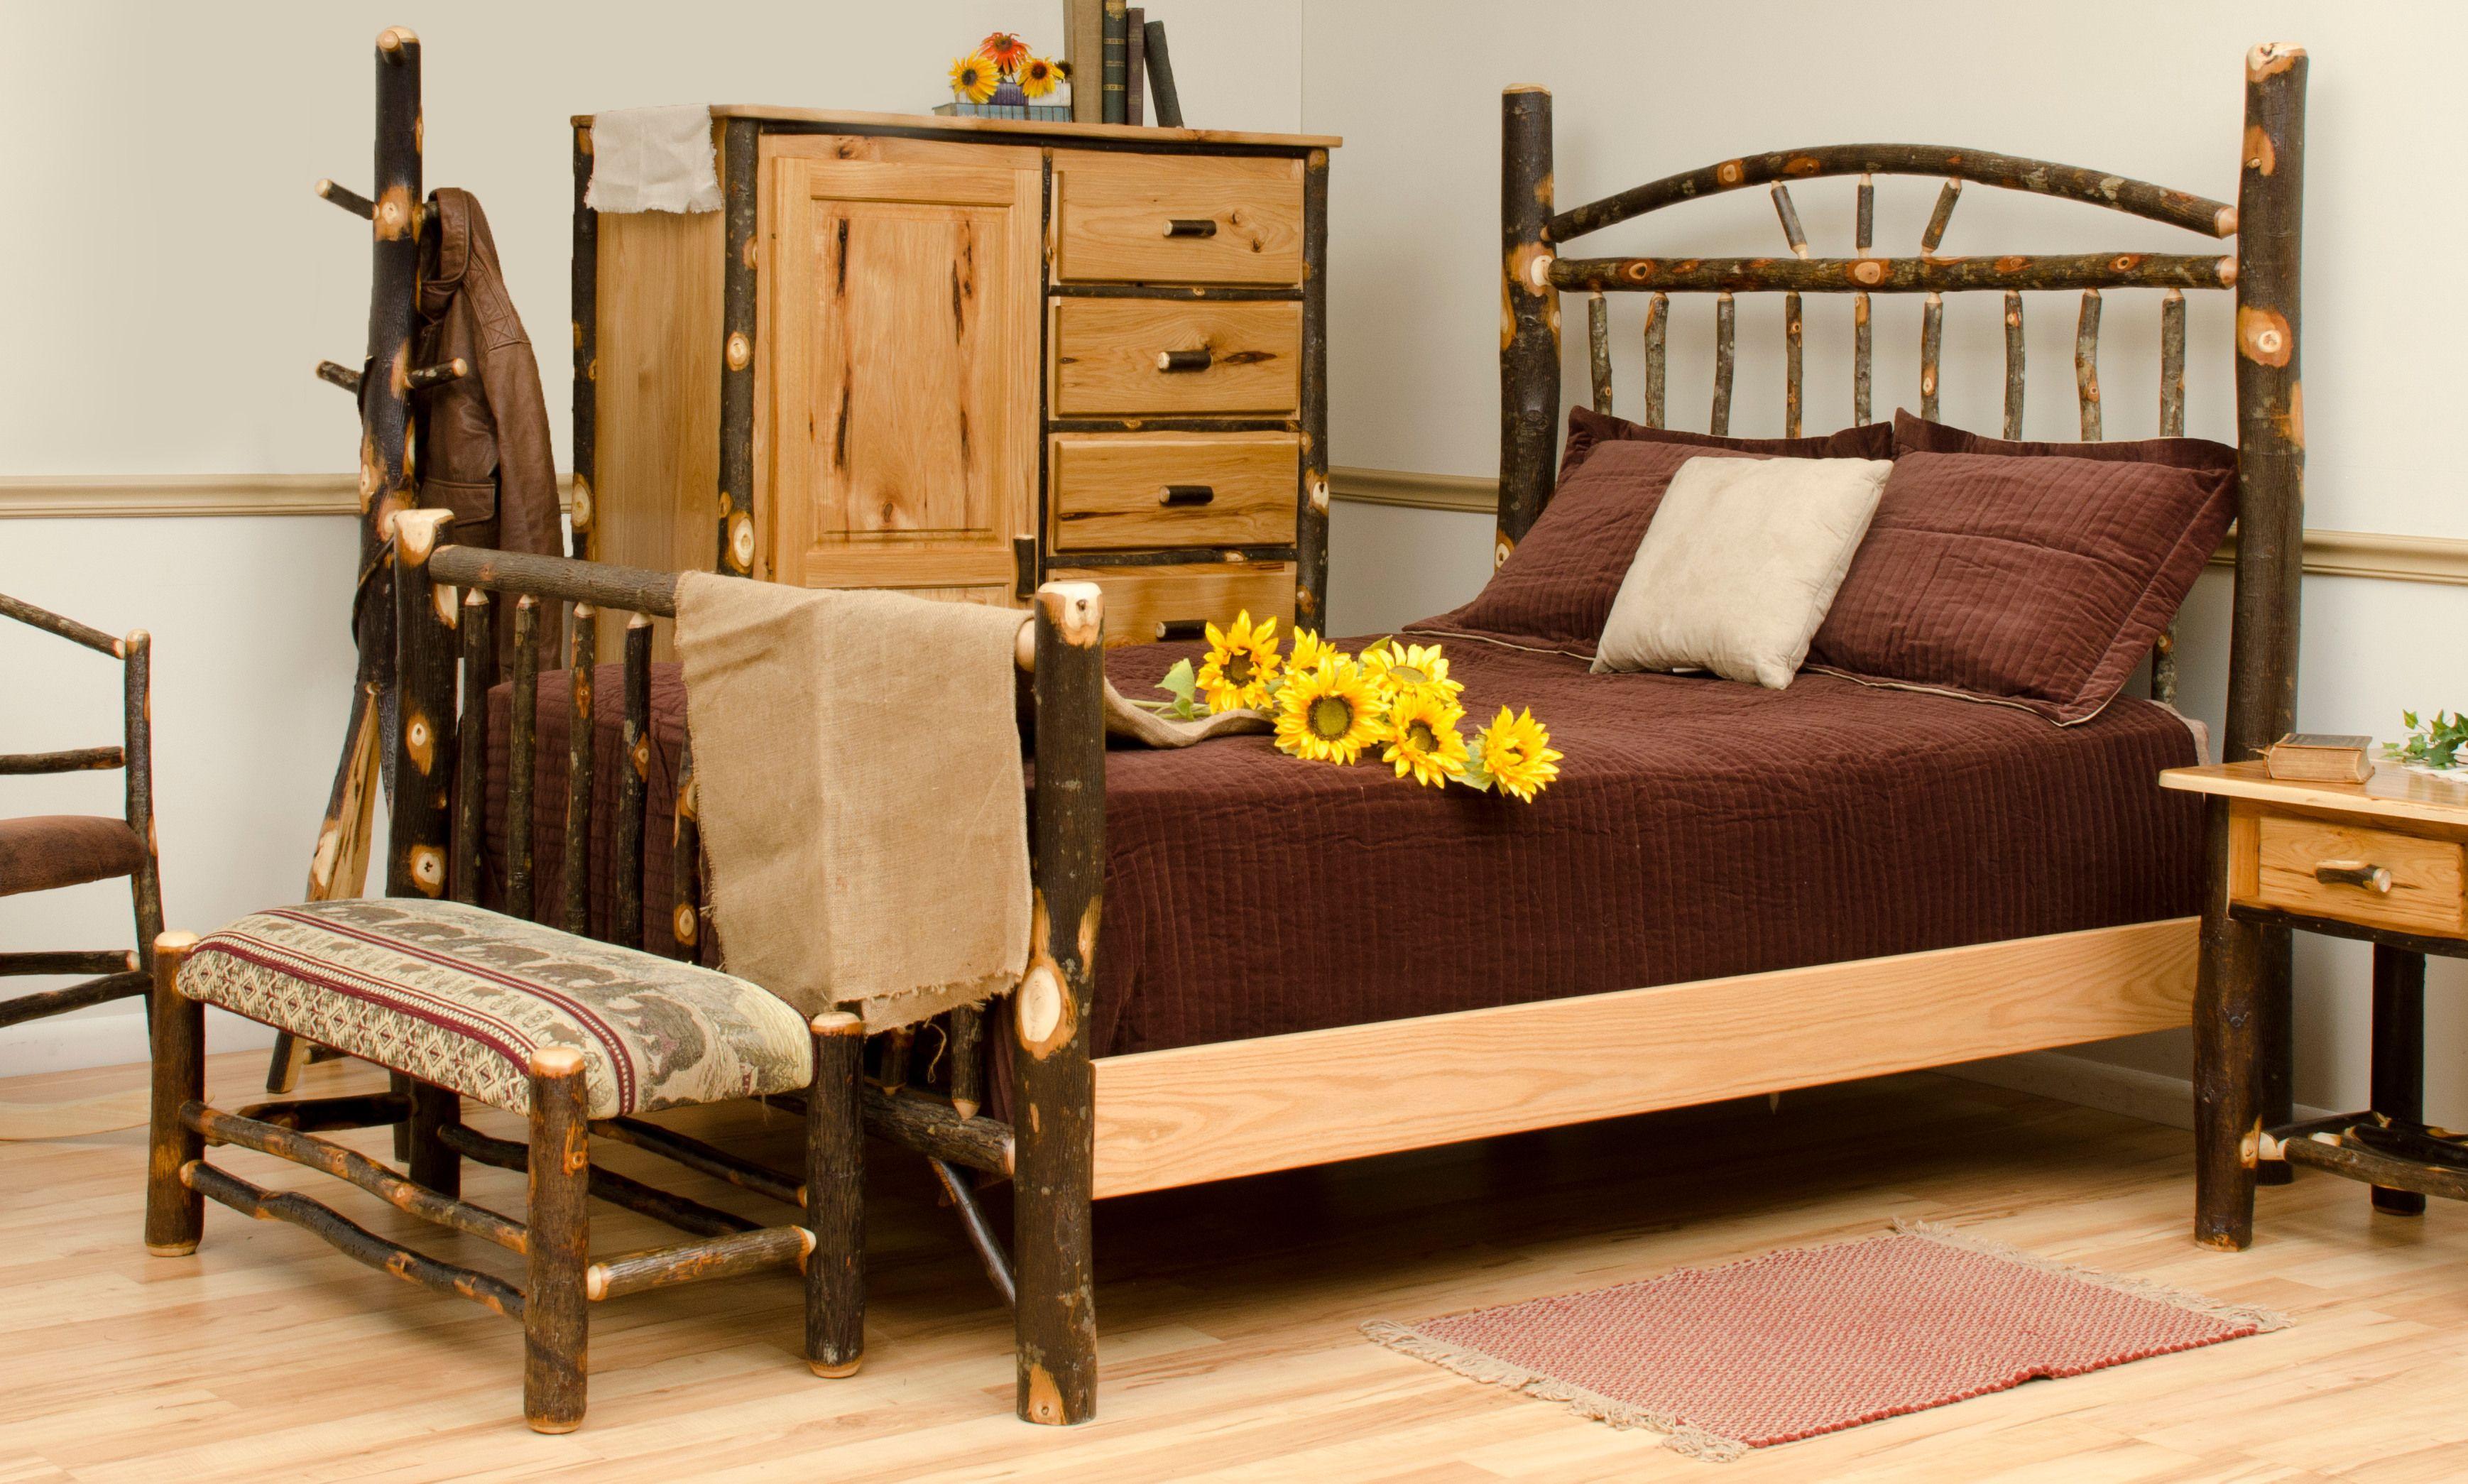 Rustic interior bedroom furniture hickory log and oak